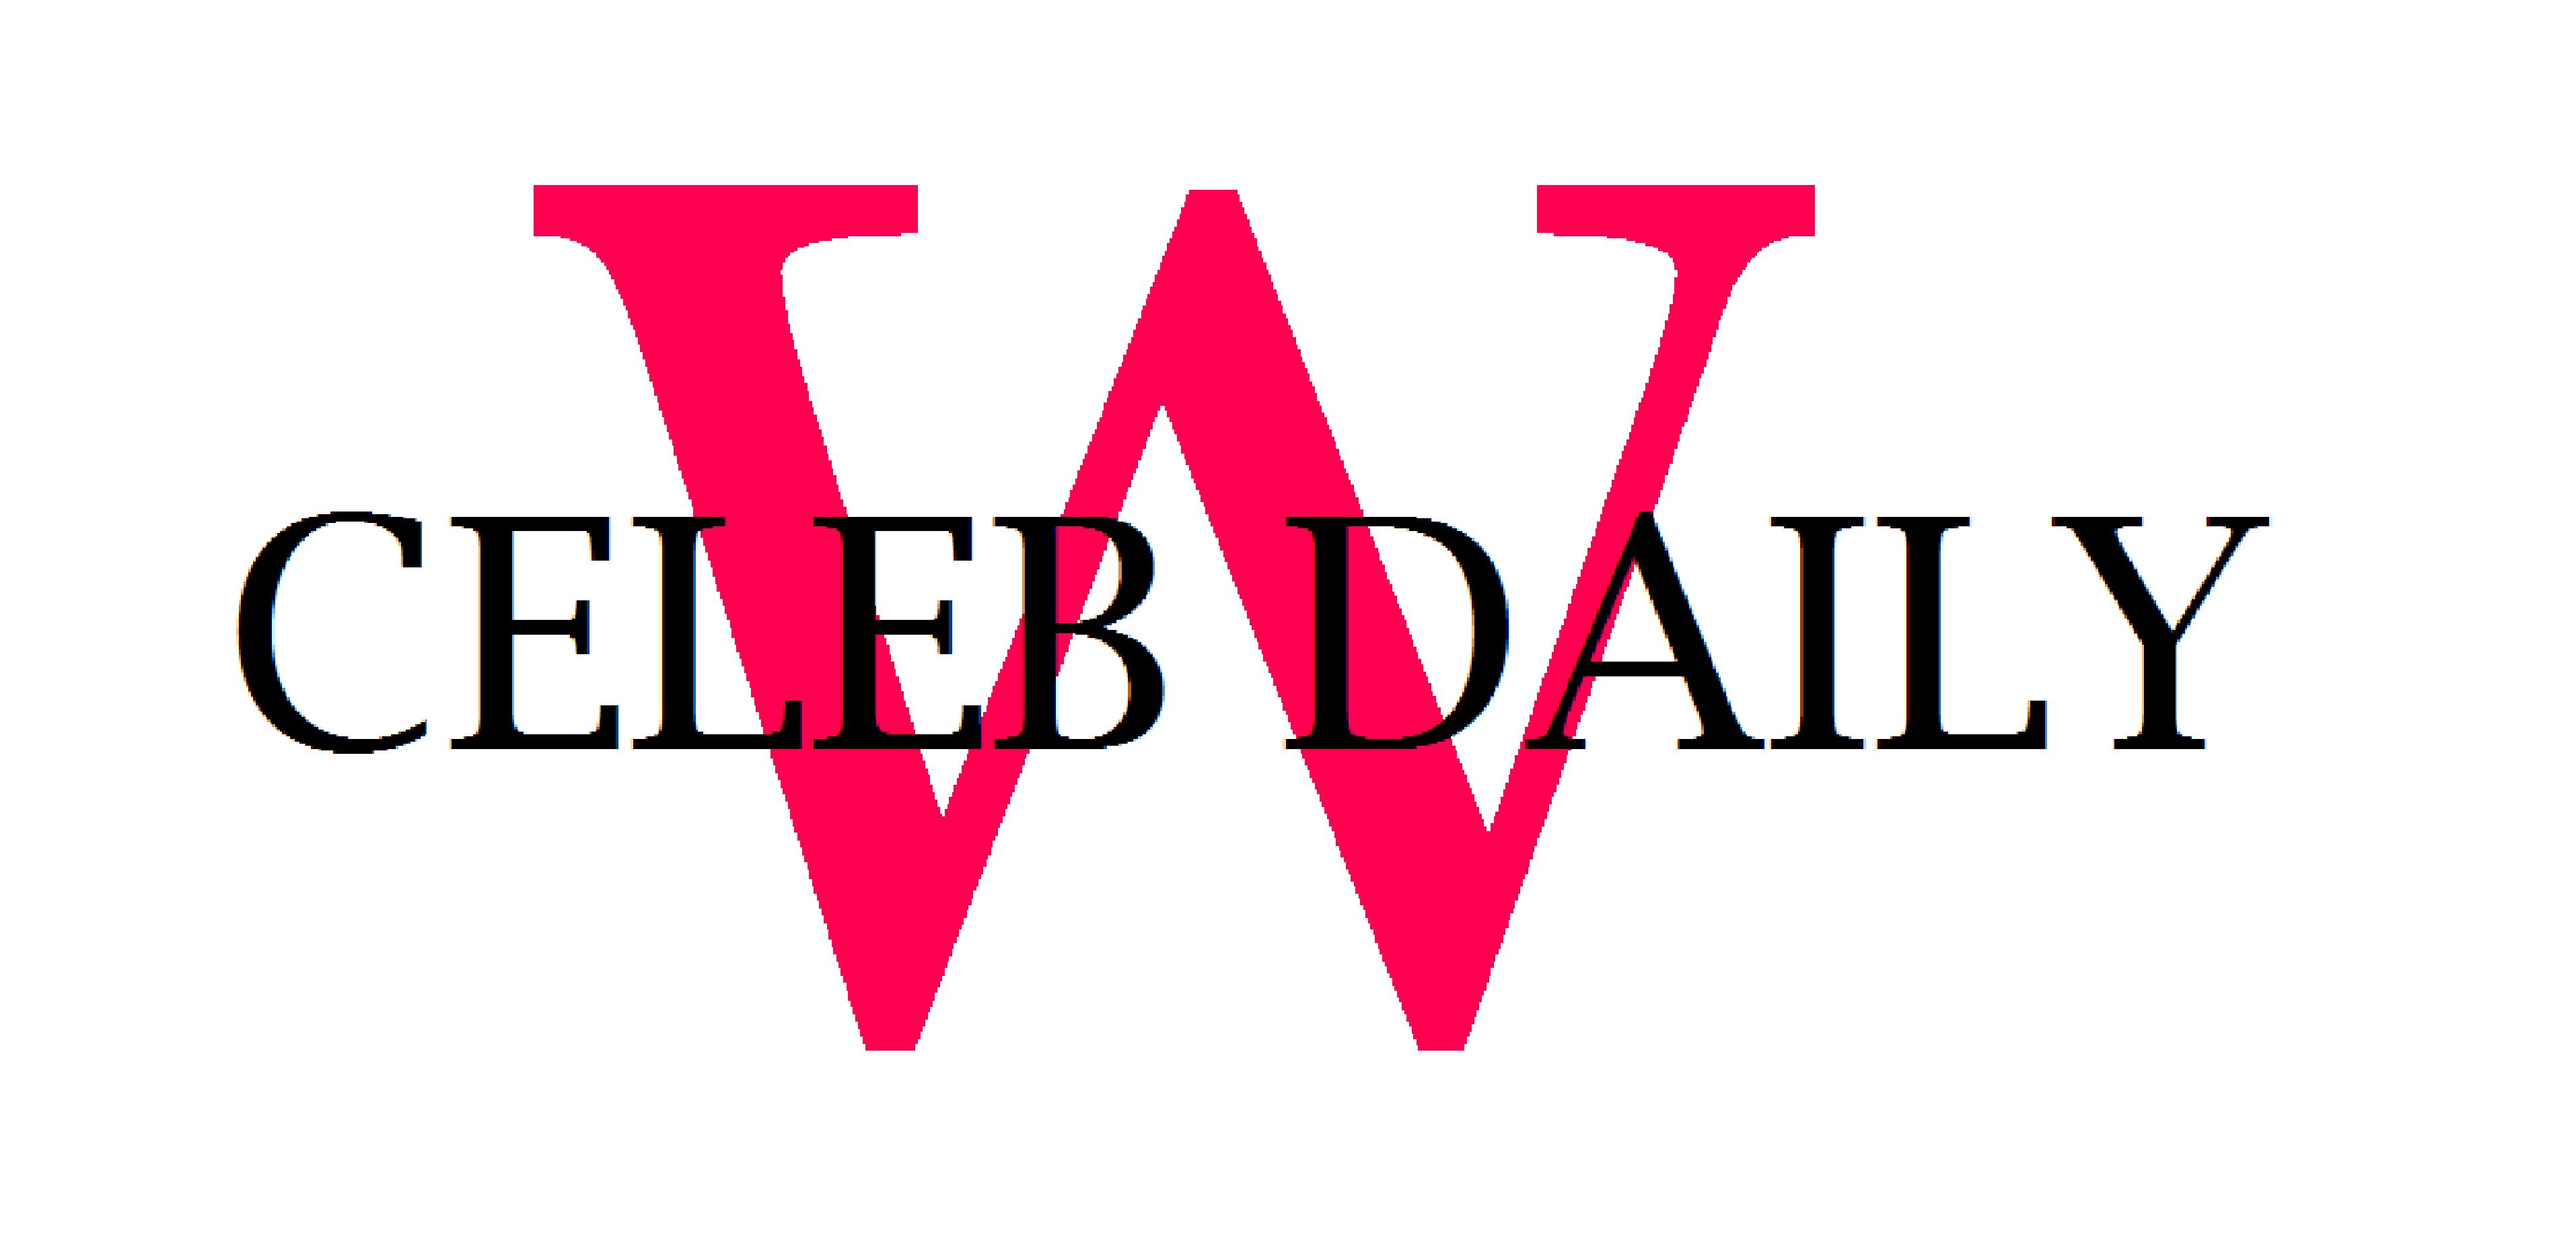 Web Celeb Daily™